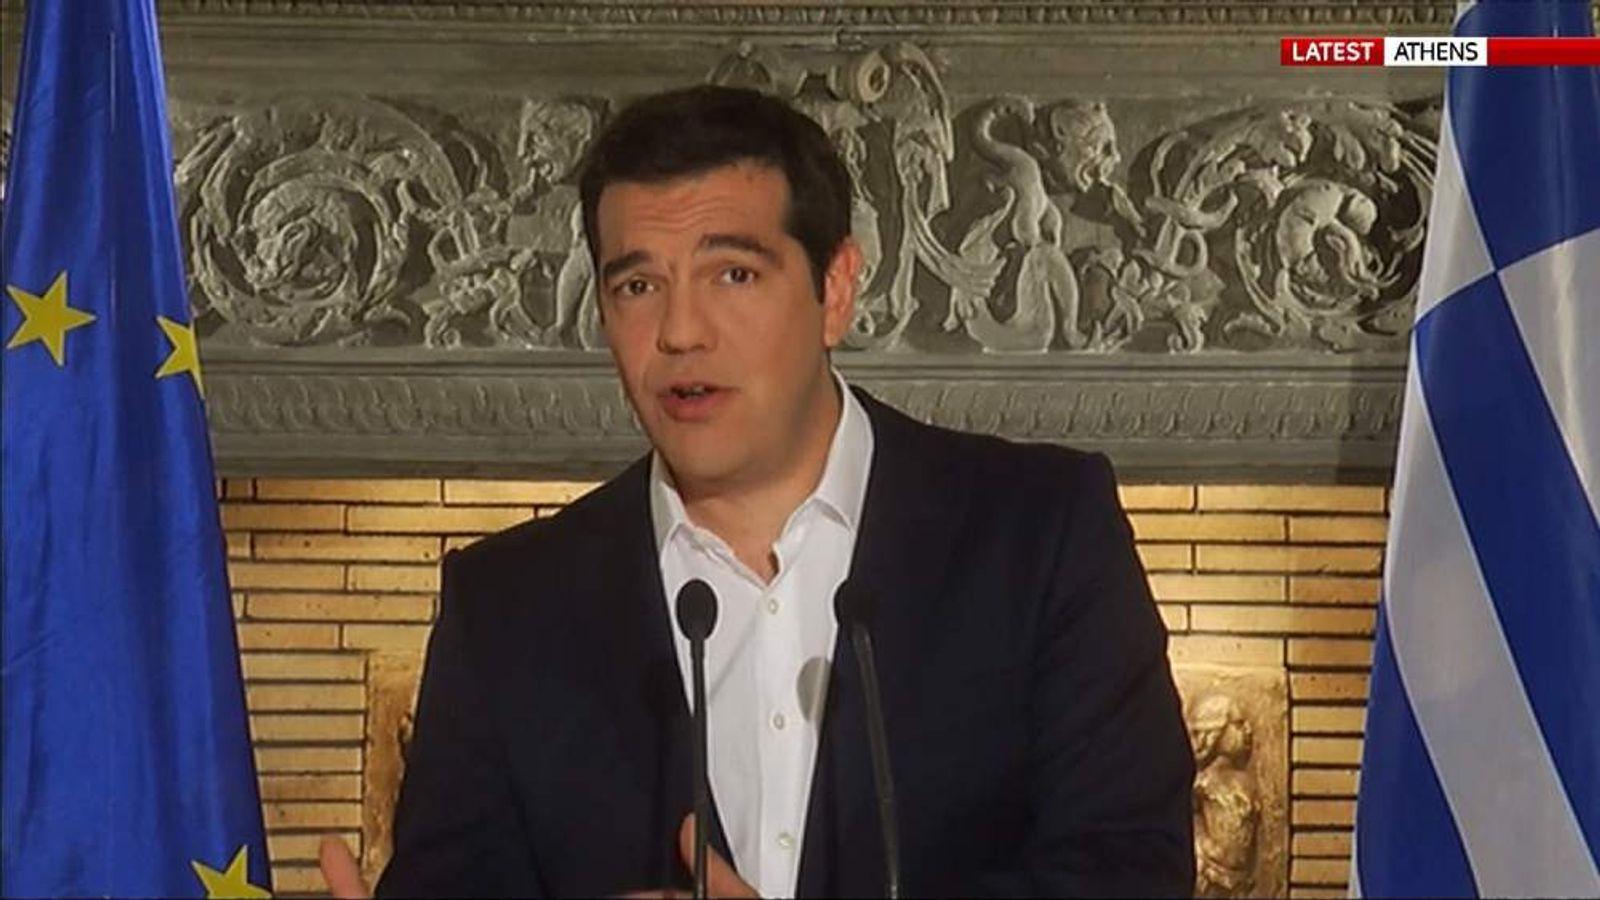 050715 GREEK REFERENDUM PM ALEXIS TSIPRAS